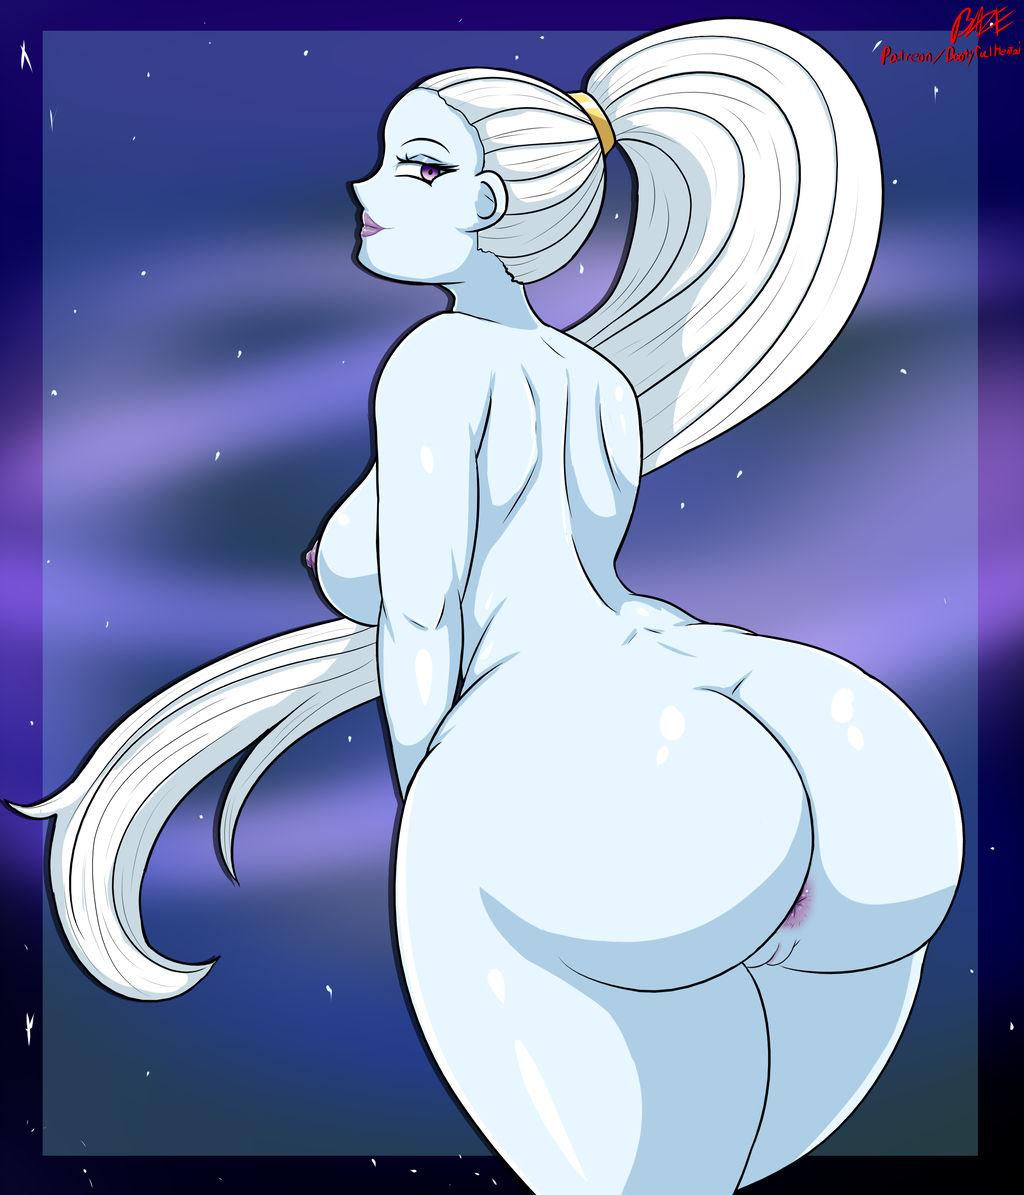 z goku dragon ball fanfiction female Daisy mario tennis aces thicc